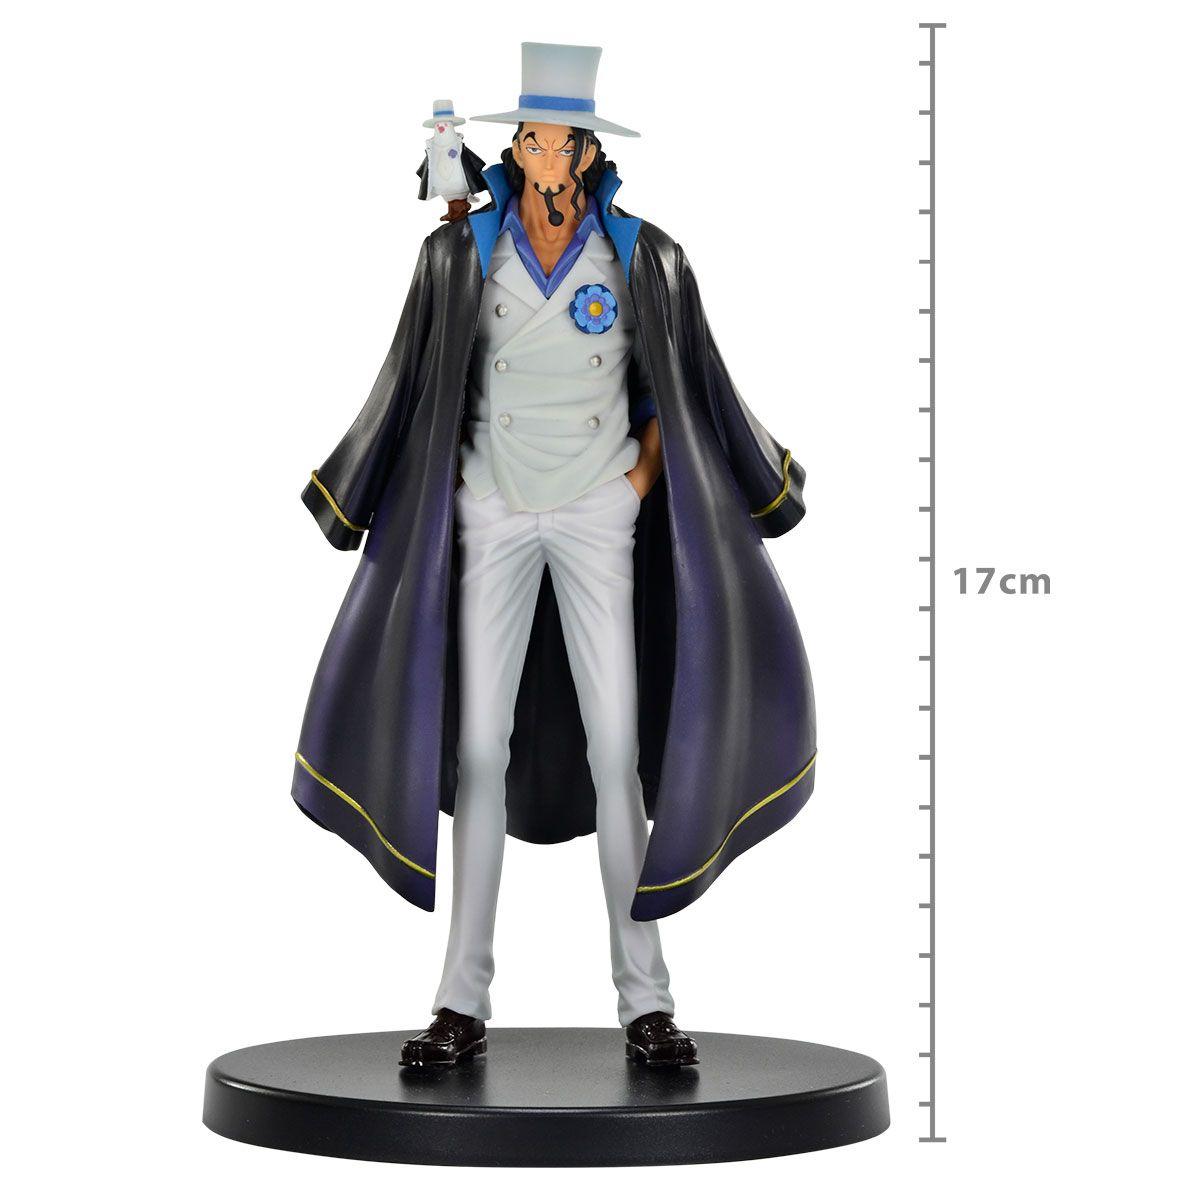 One Piece Stampede - Rob Lucci - DXF The Grandline Men Vol. 3 - Bandai Banpresto